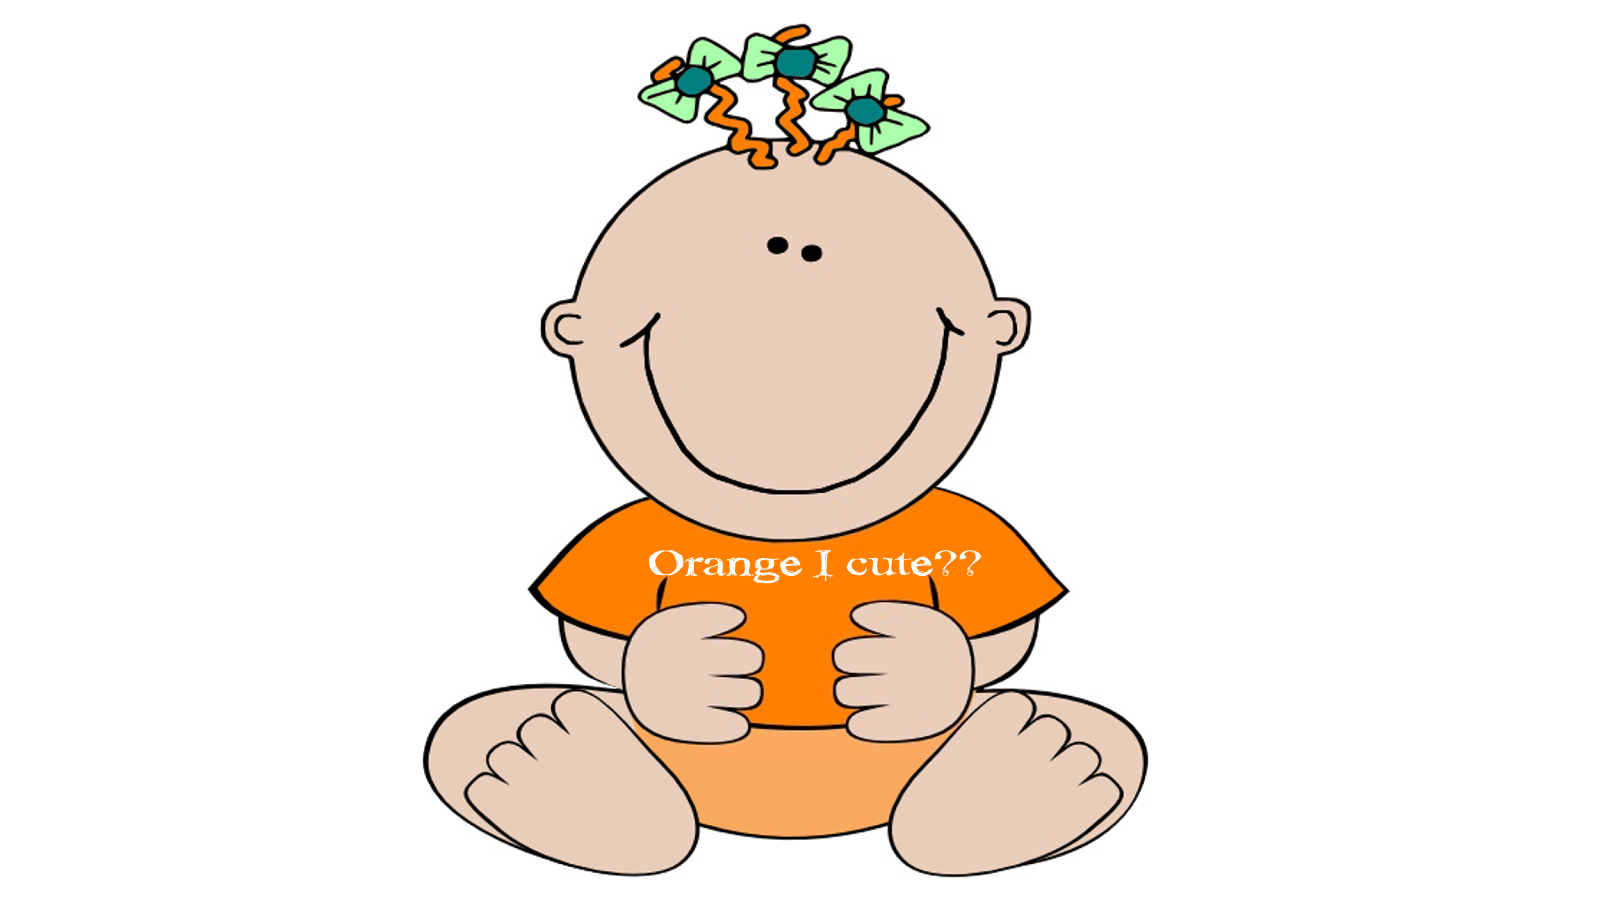 Nose clipart children's. Baby orange cute free